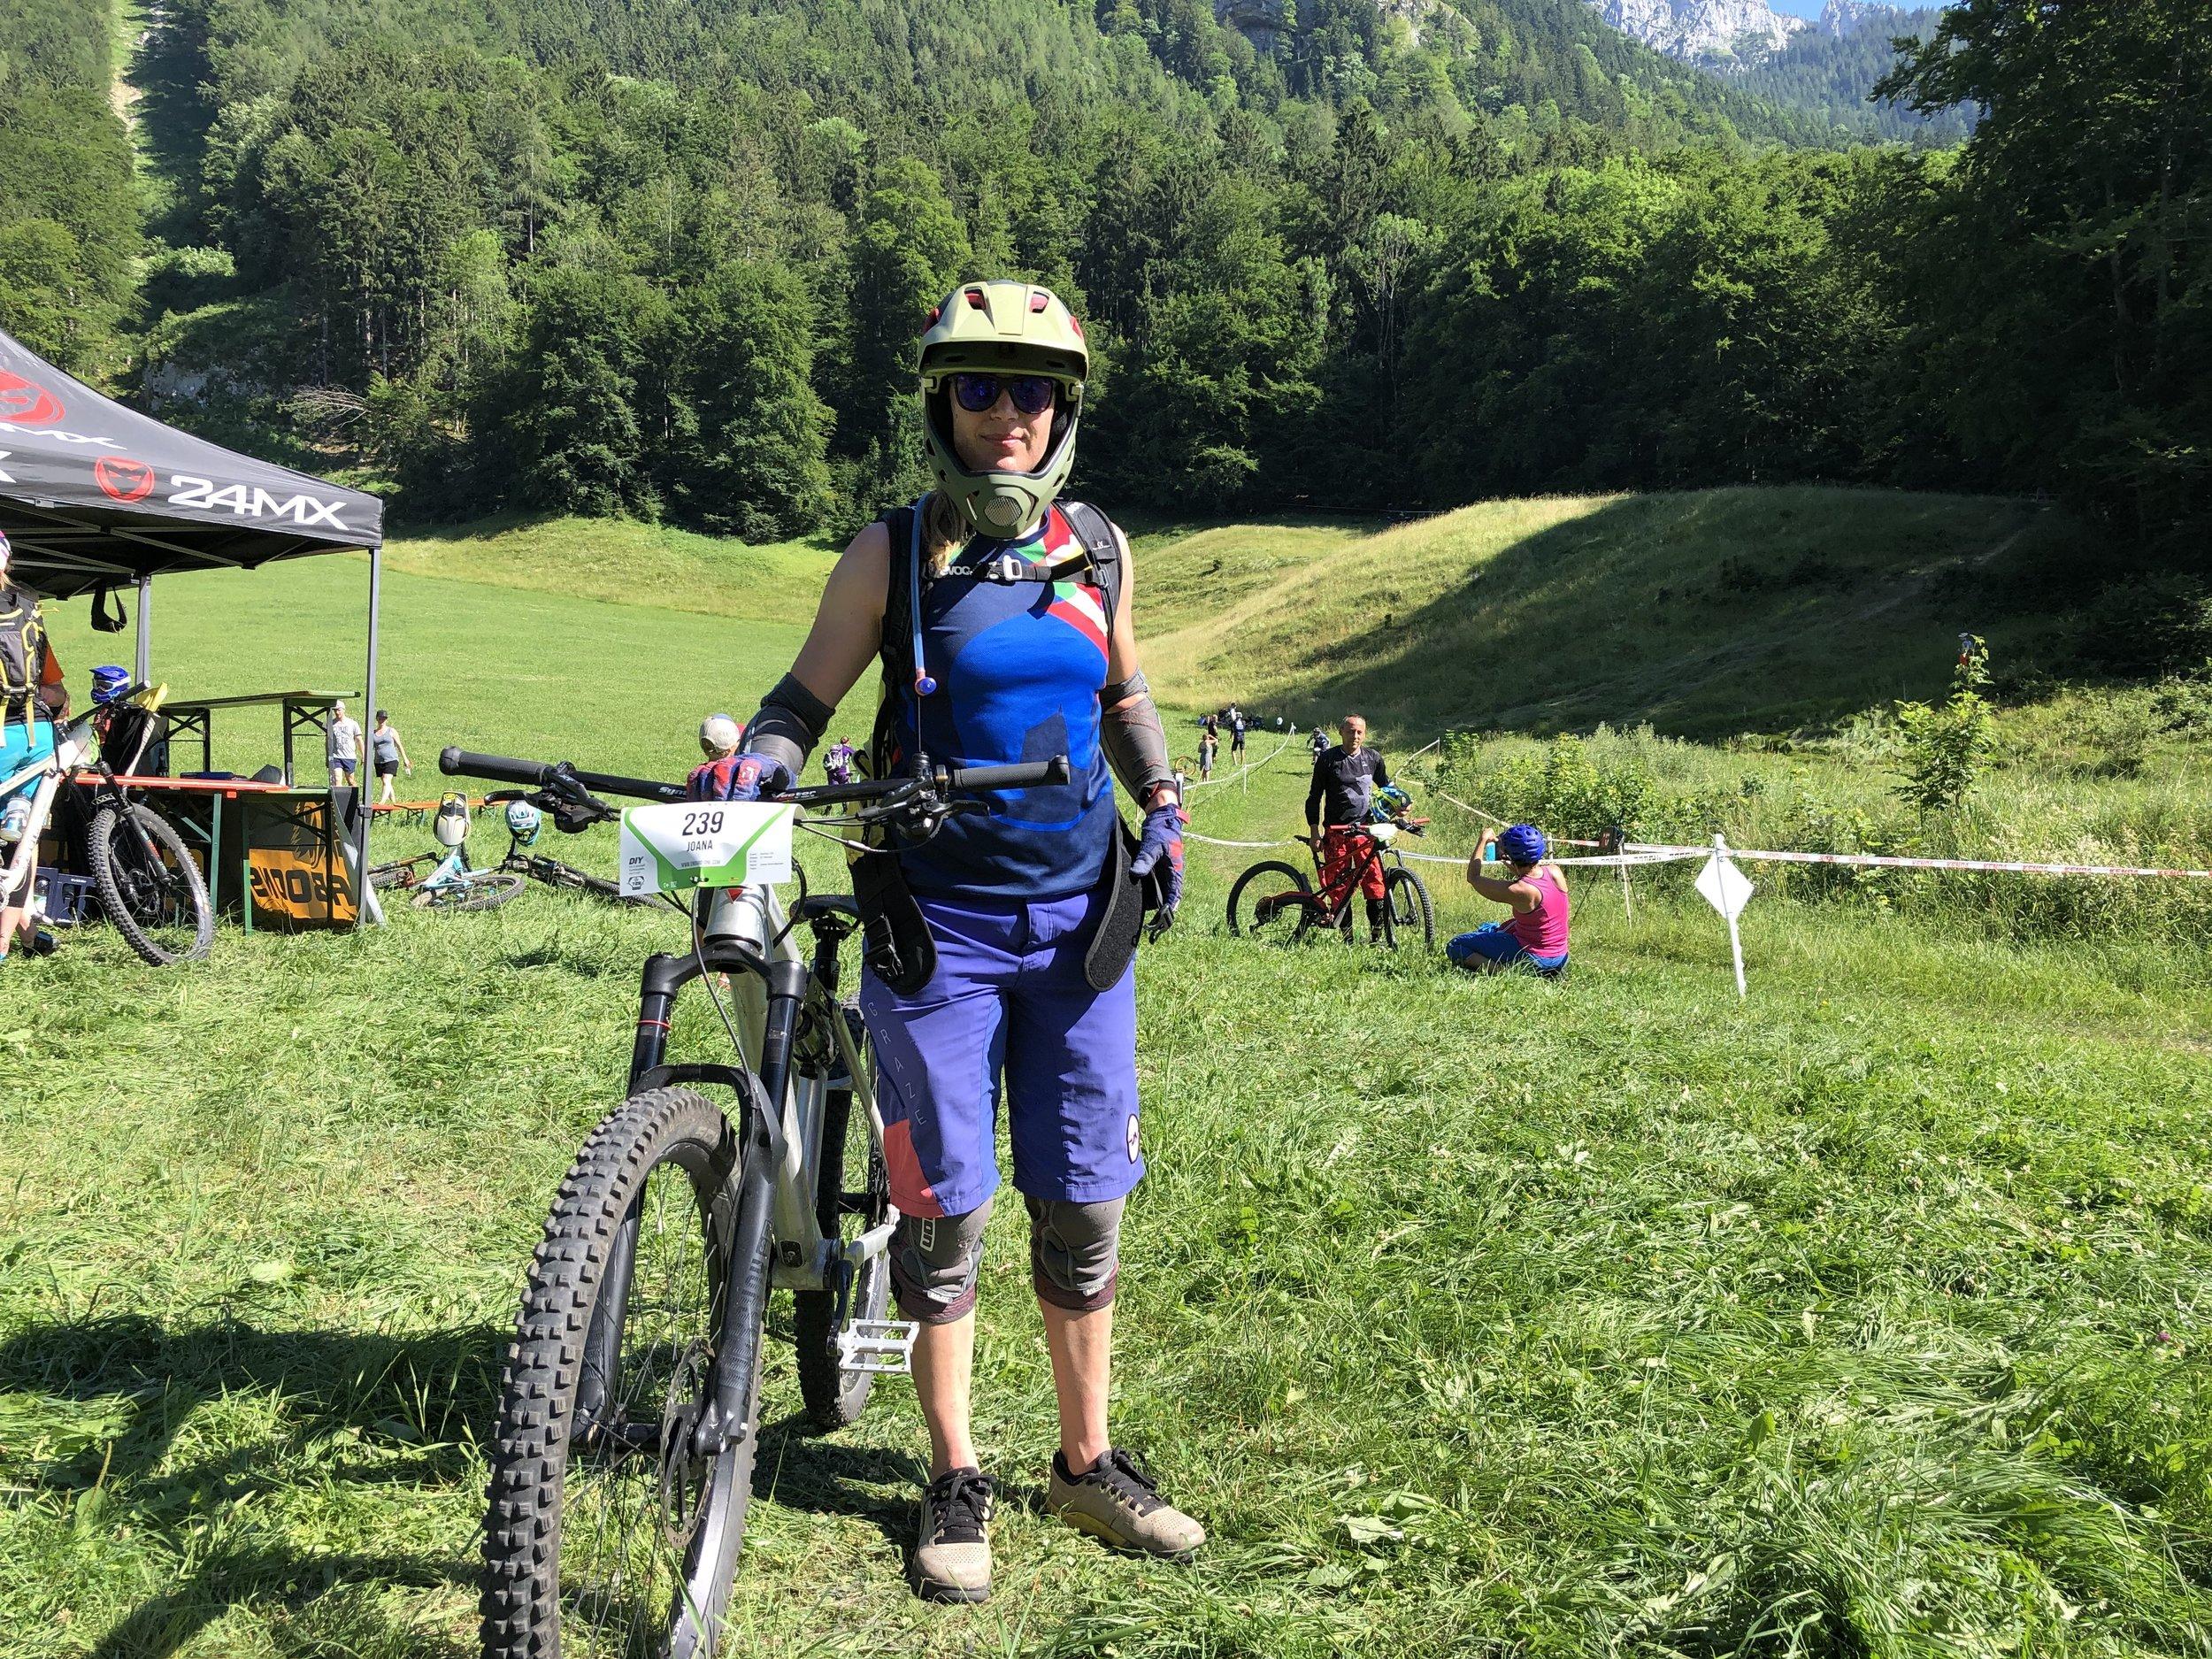 Yay - Prolog geschafft (c) Michael Negeli